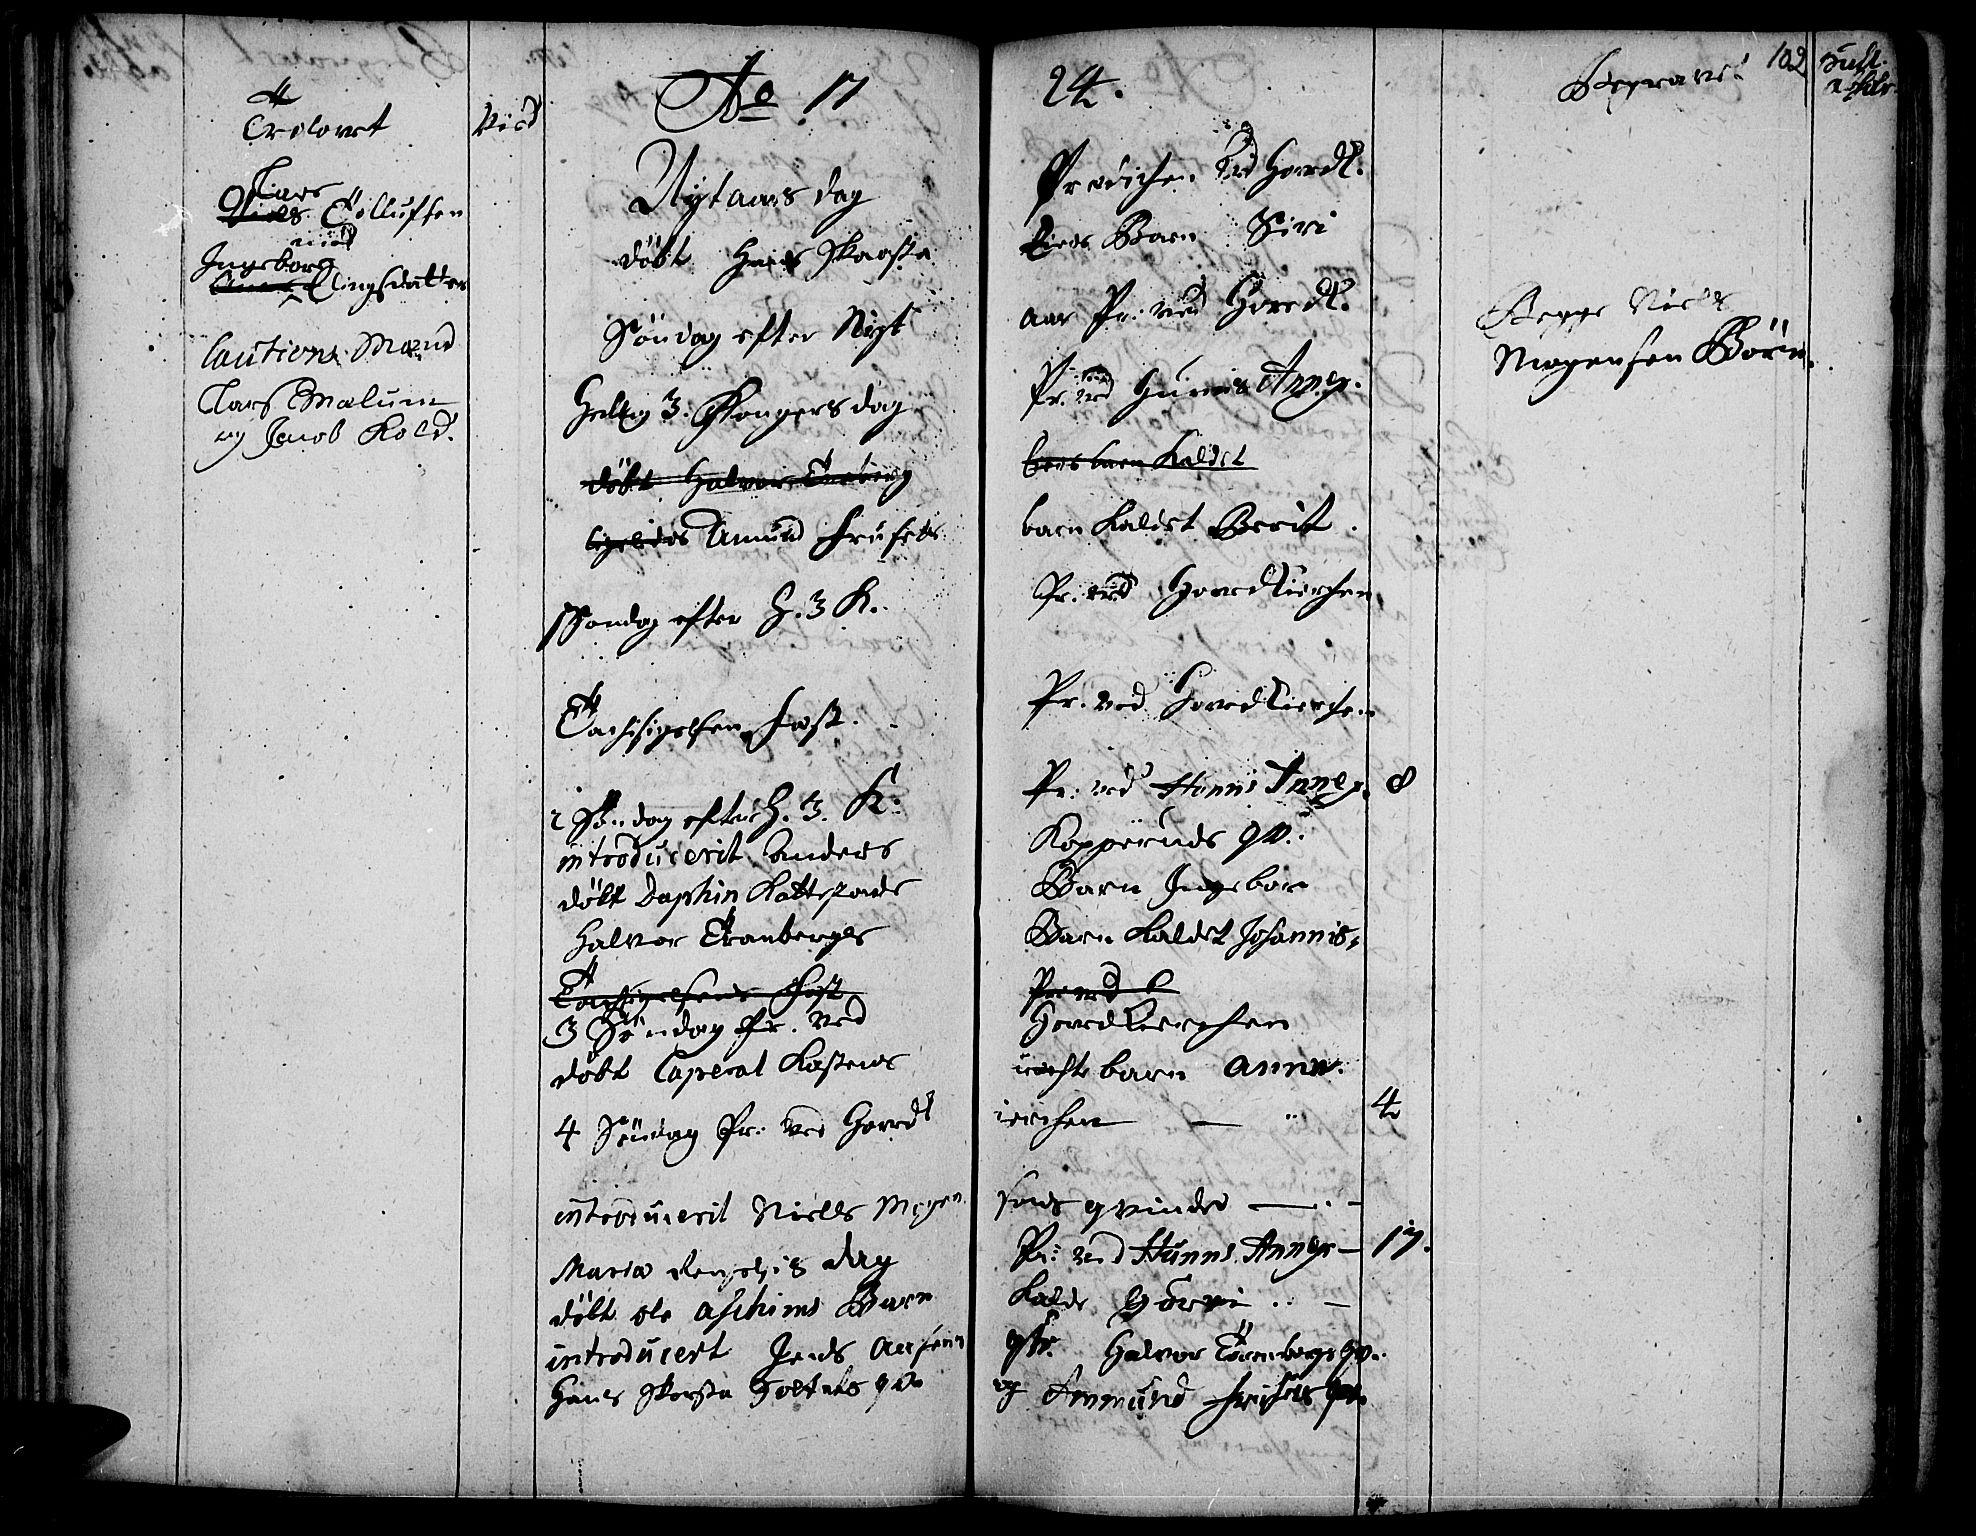 SAH, Vardal prestekontor, H/Ha/Haa/L0001: Ministerialbok nr. 1, 1706-1748, s. 102